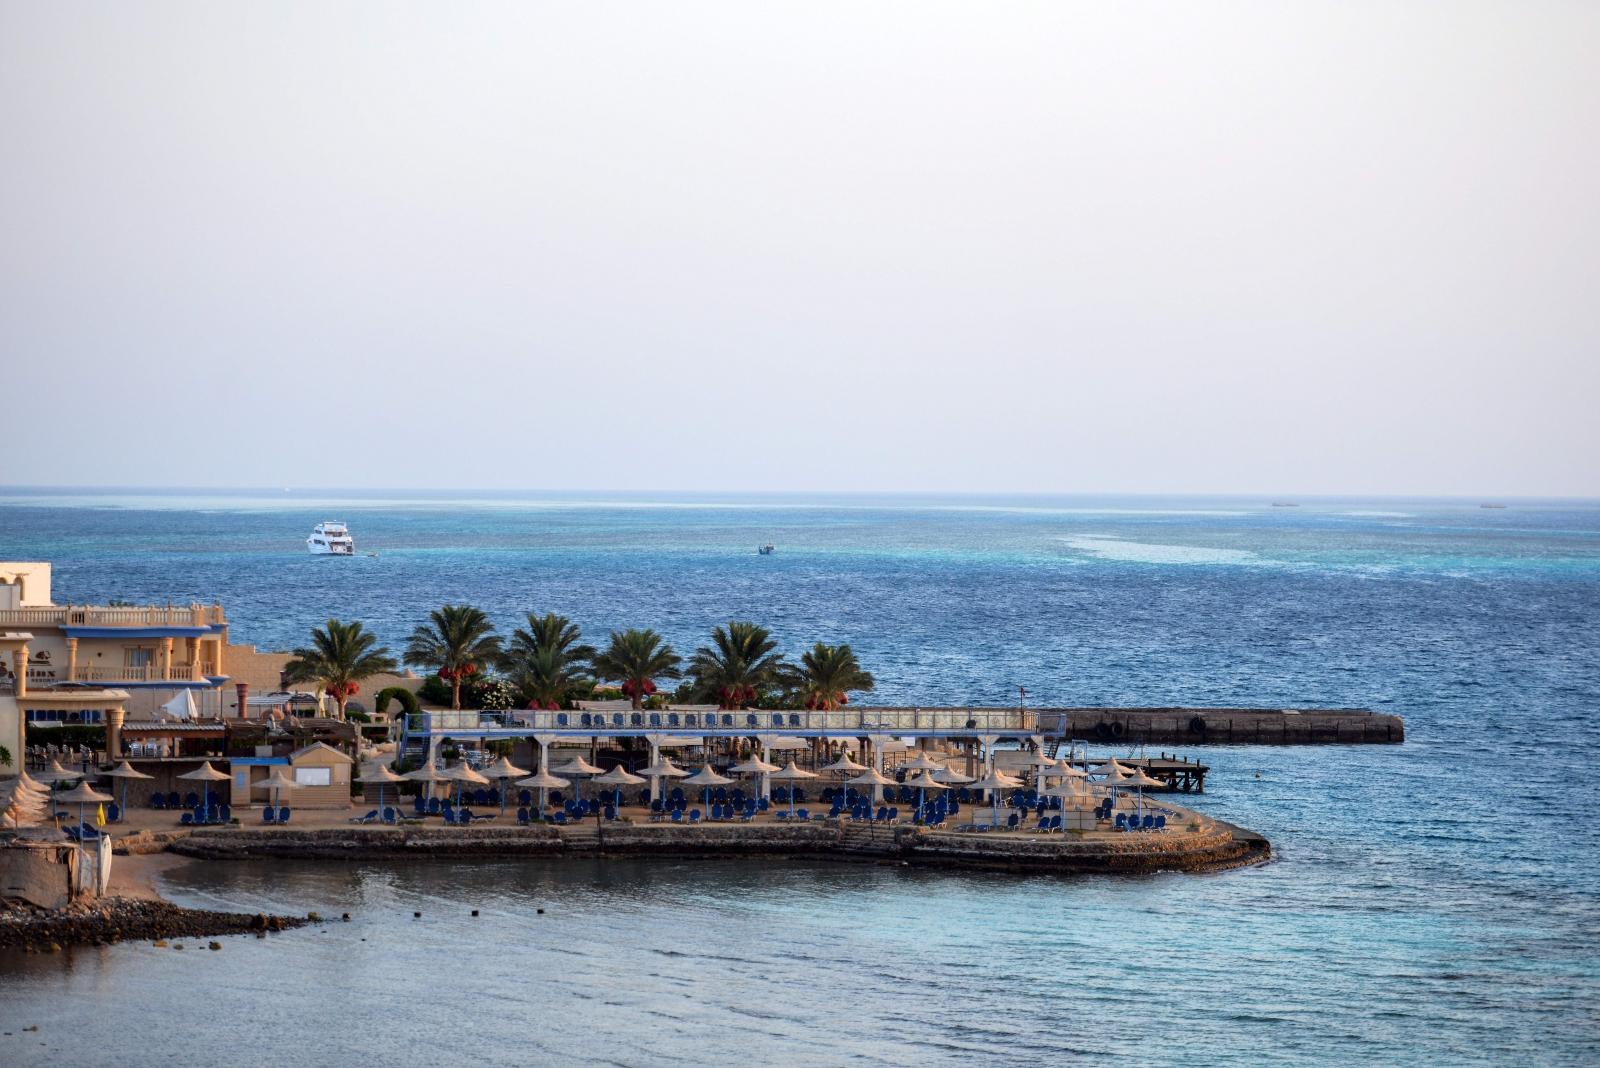 Egyptian hotel, Red Sea resort